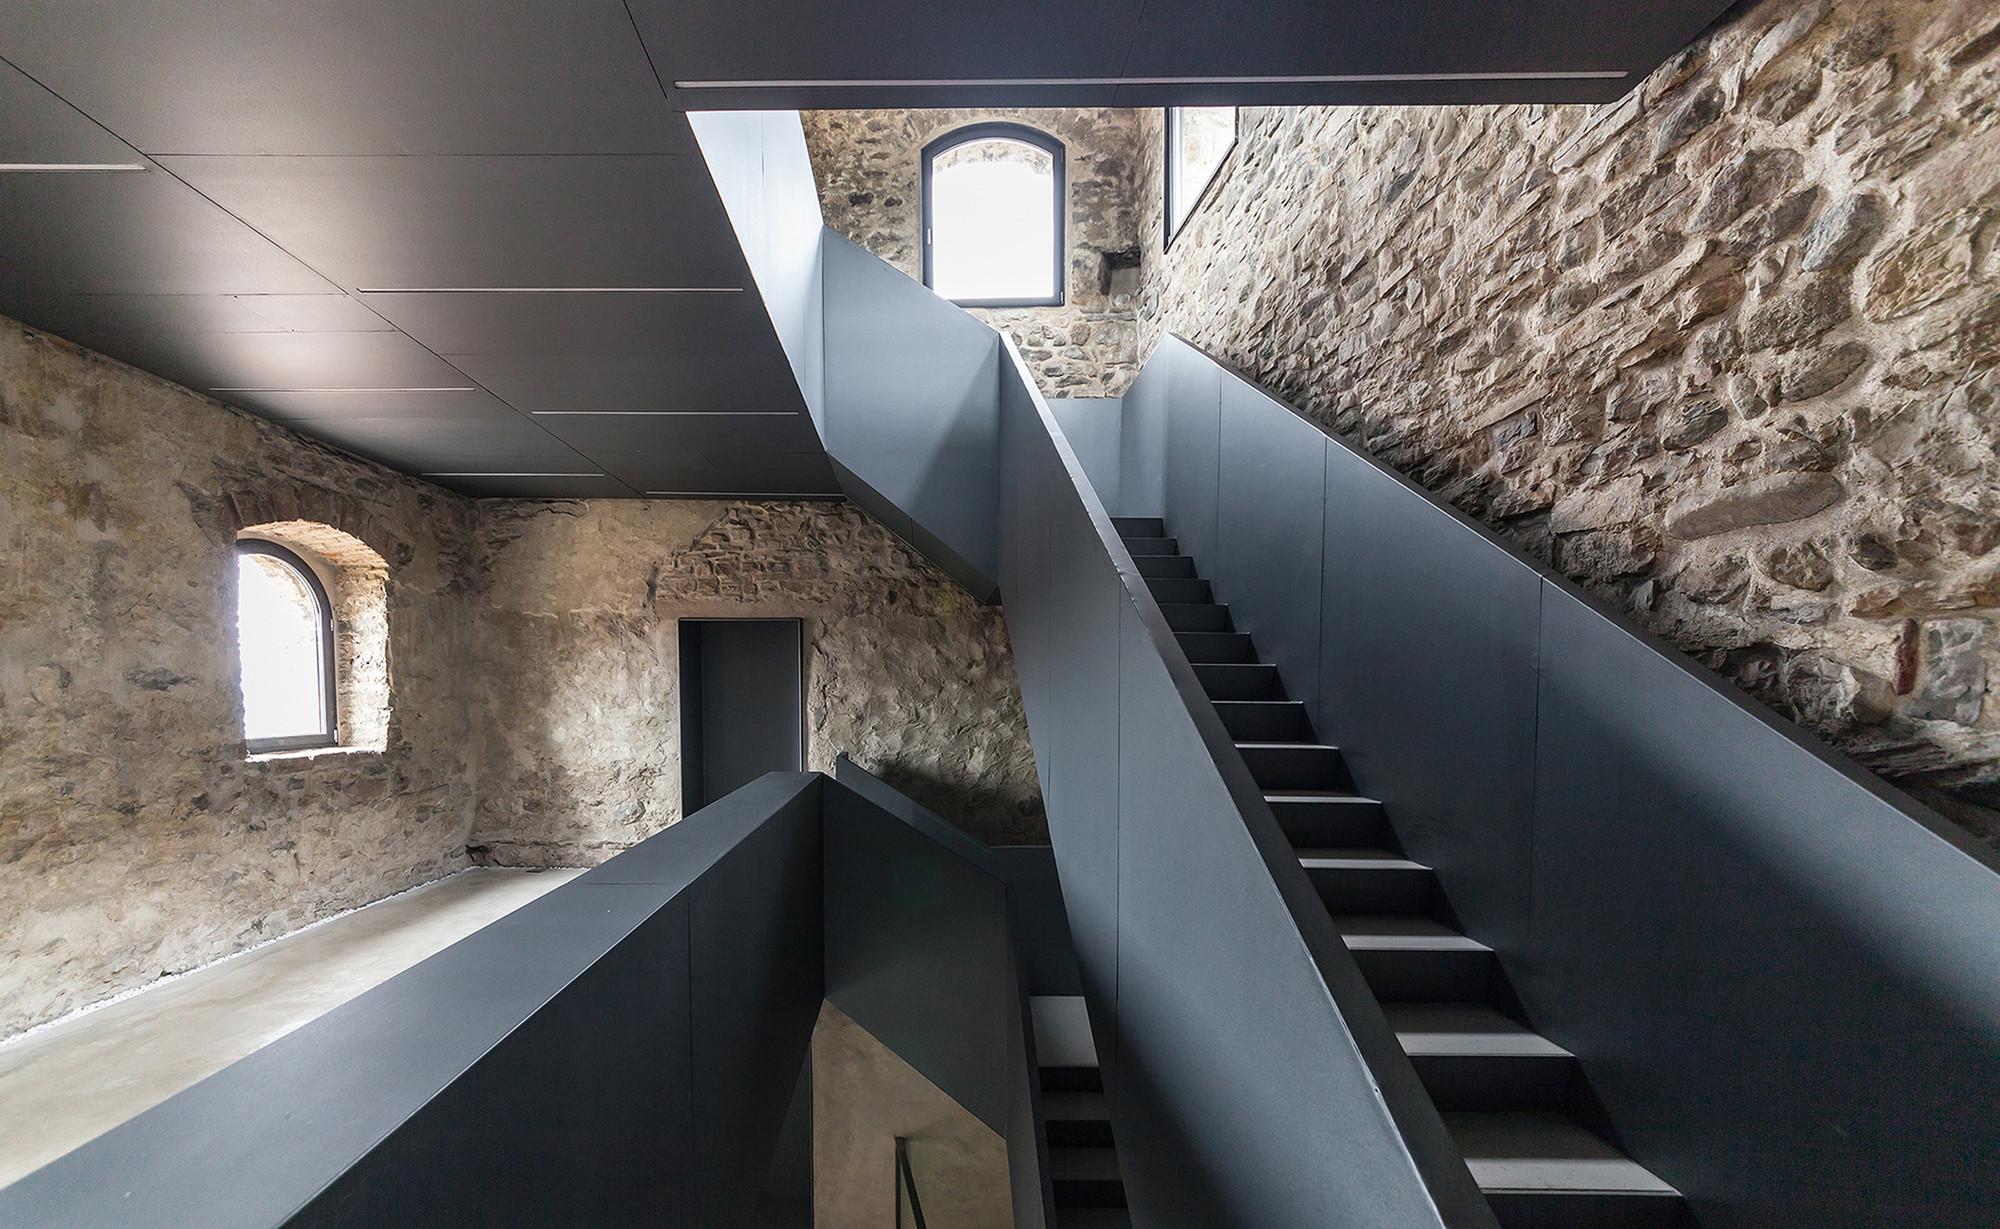 Torre del Borgo / Gianluca Gelmini, Courtesy of Gianluca Gelmini